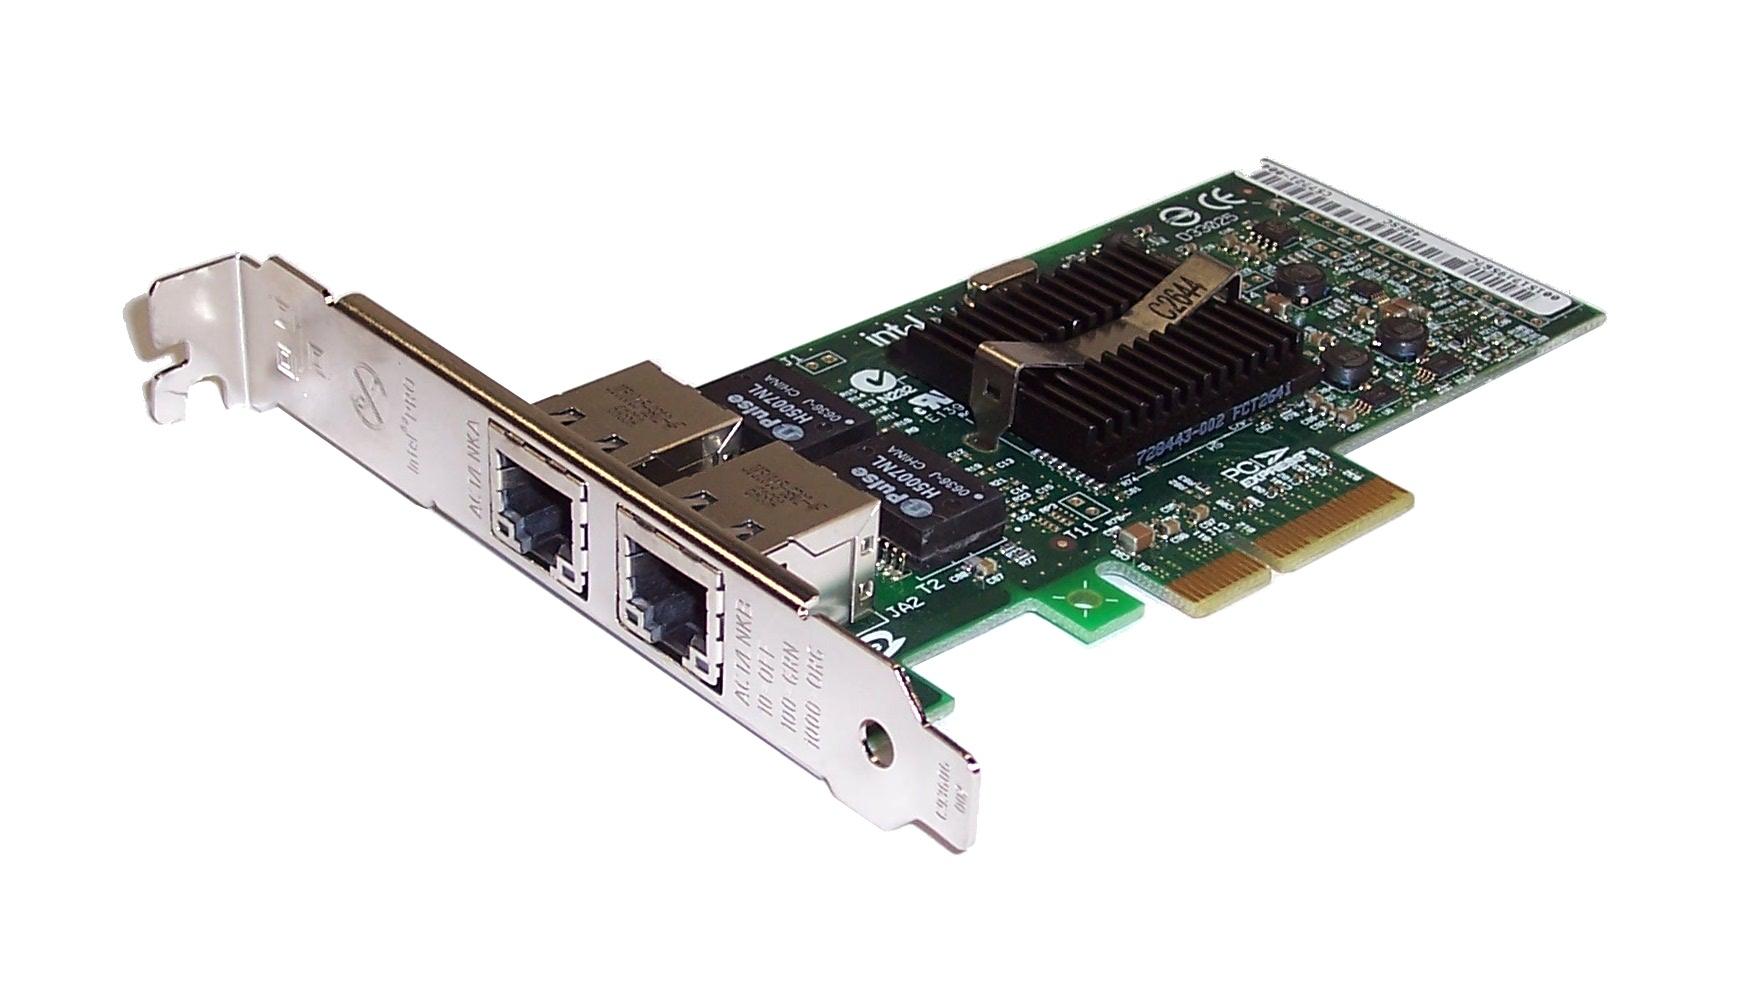 Dell X3959 C57721-005 PCIe Dual Port Gigabit Network Interface Card